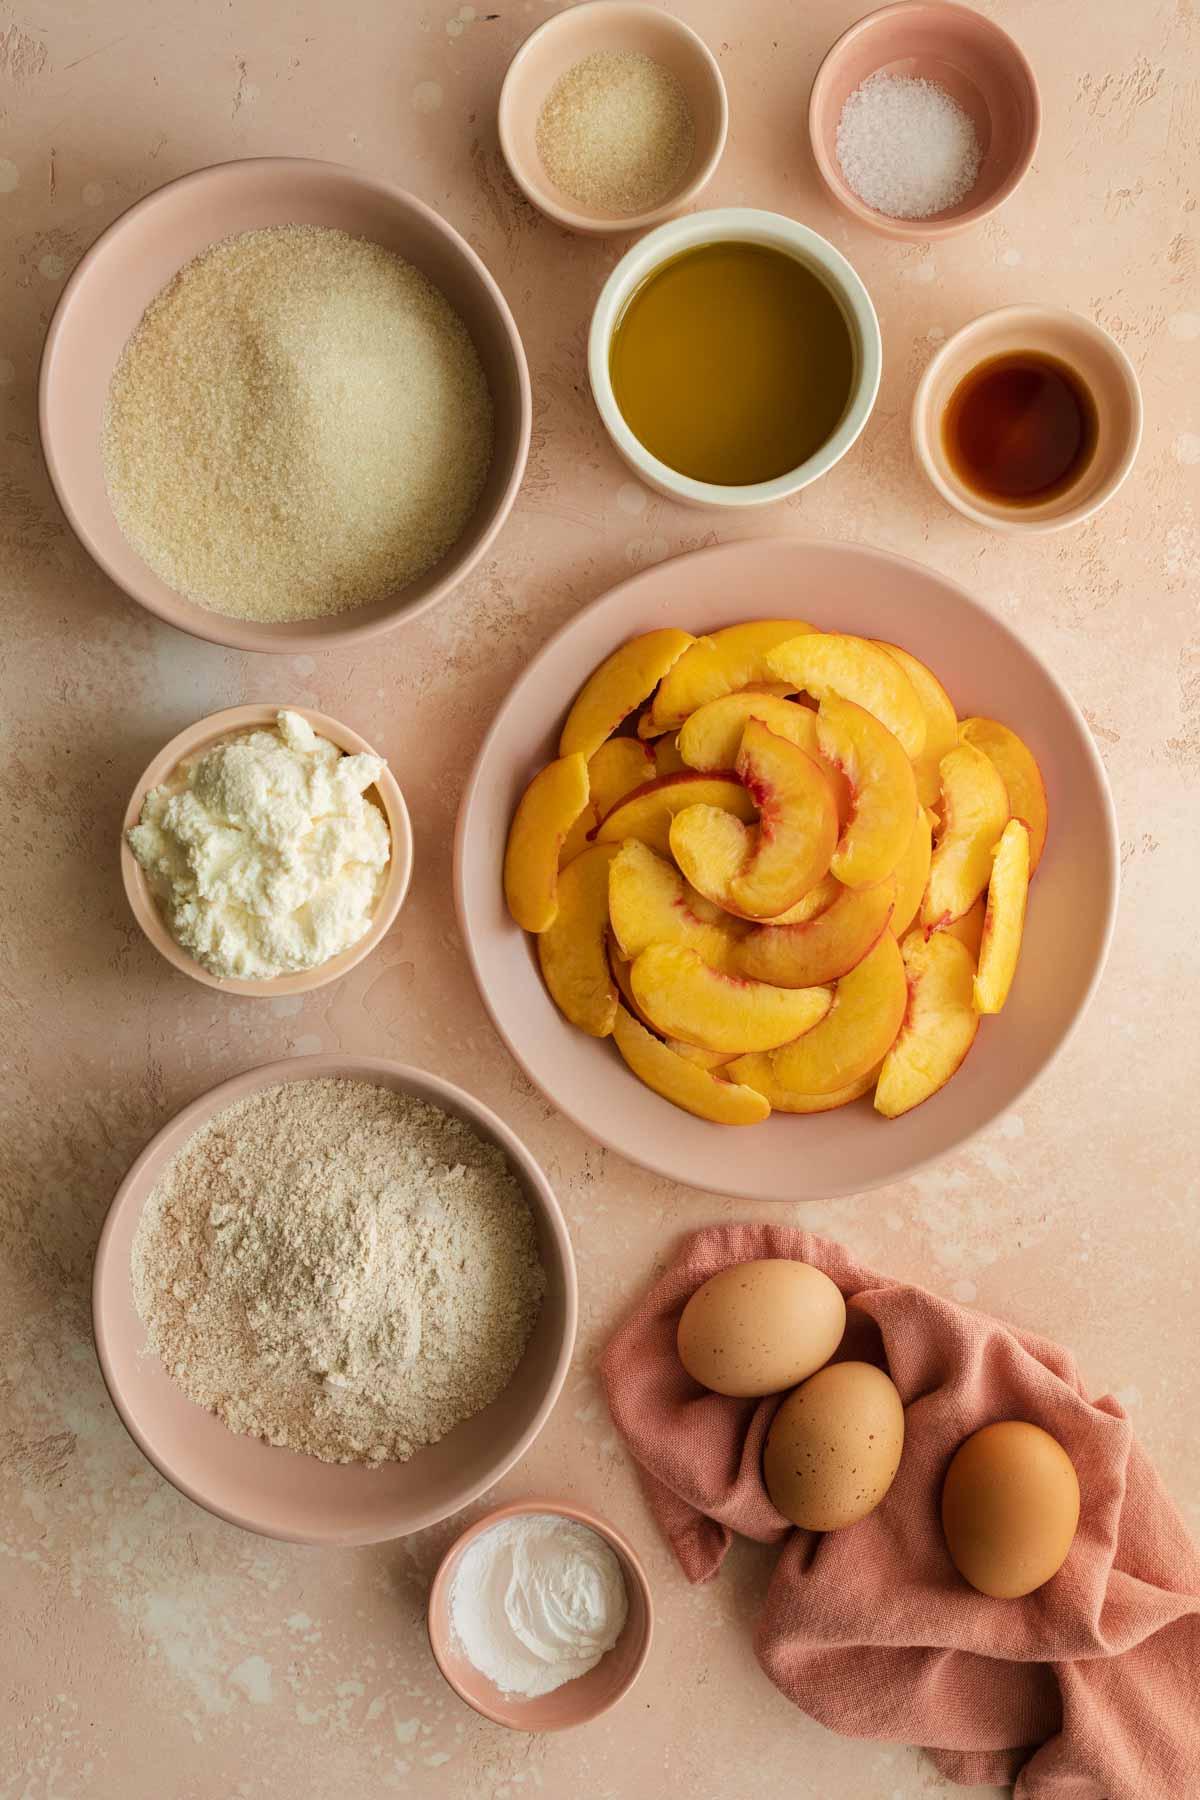 Ingredients to make peach cake arranged individually.